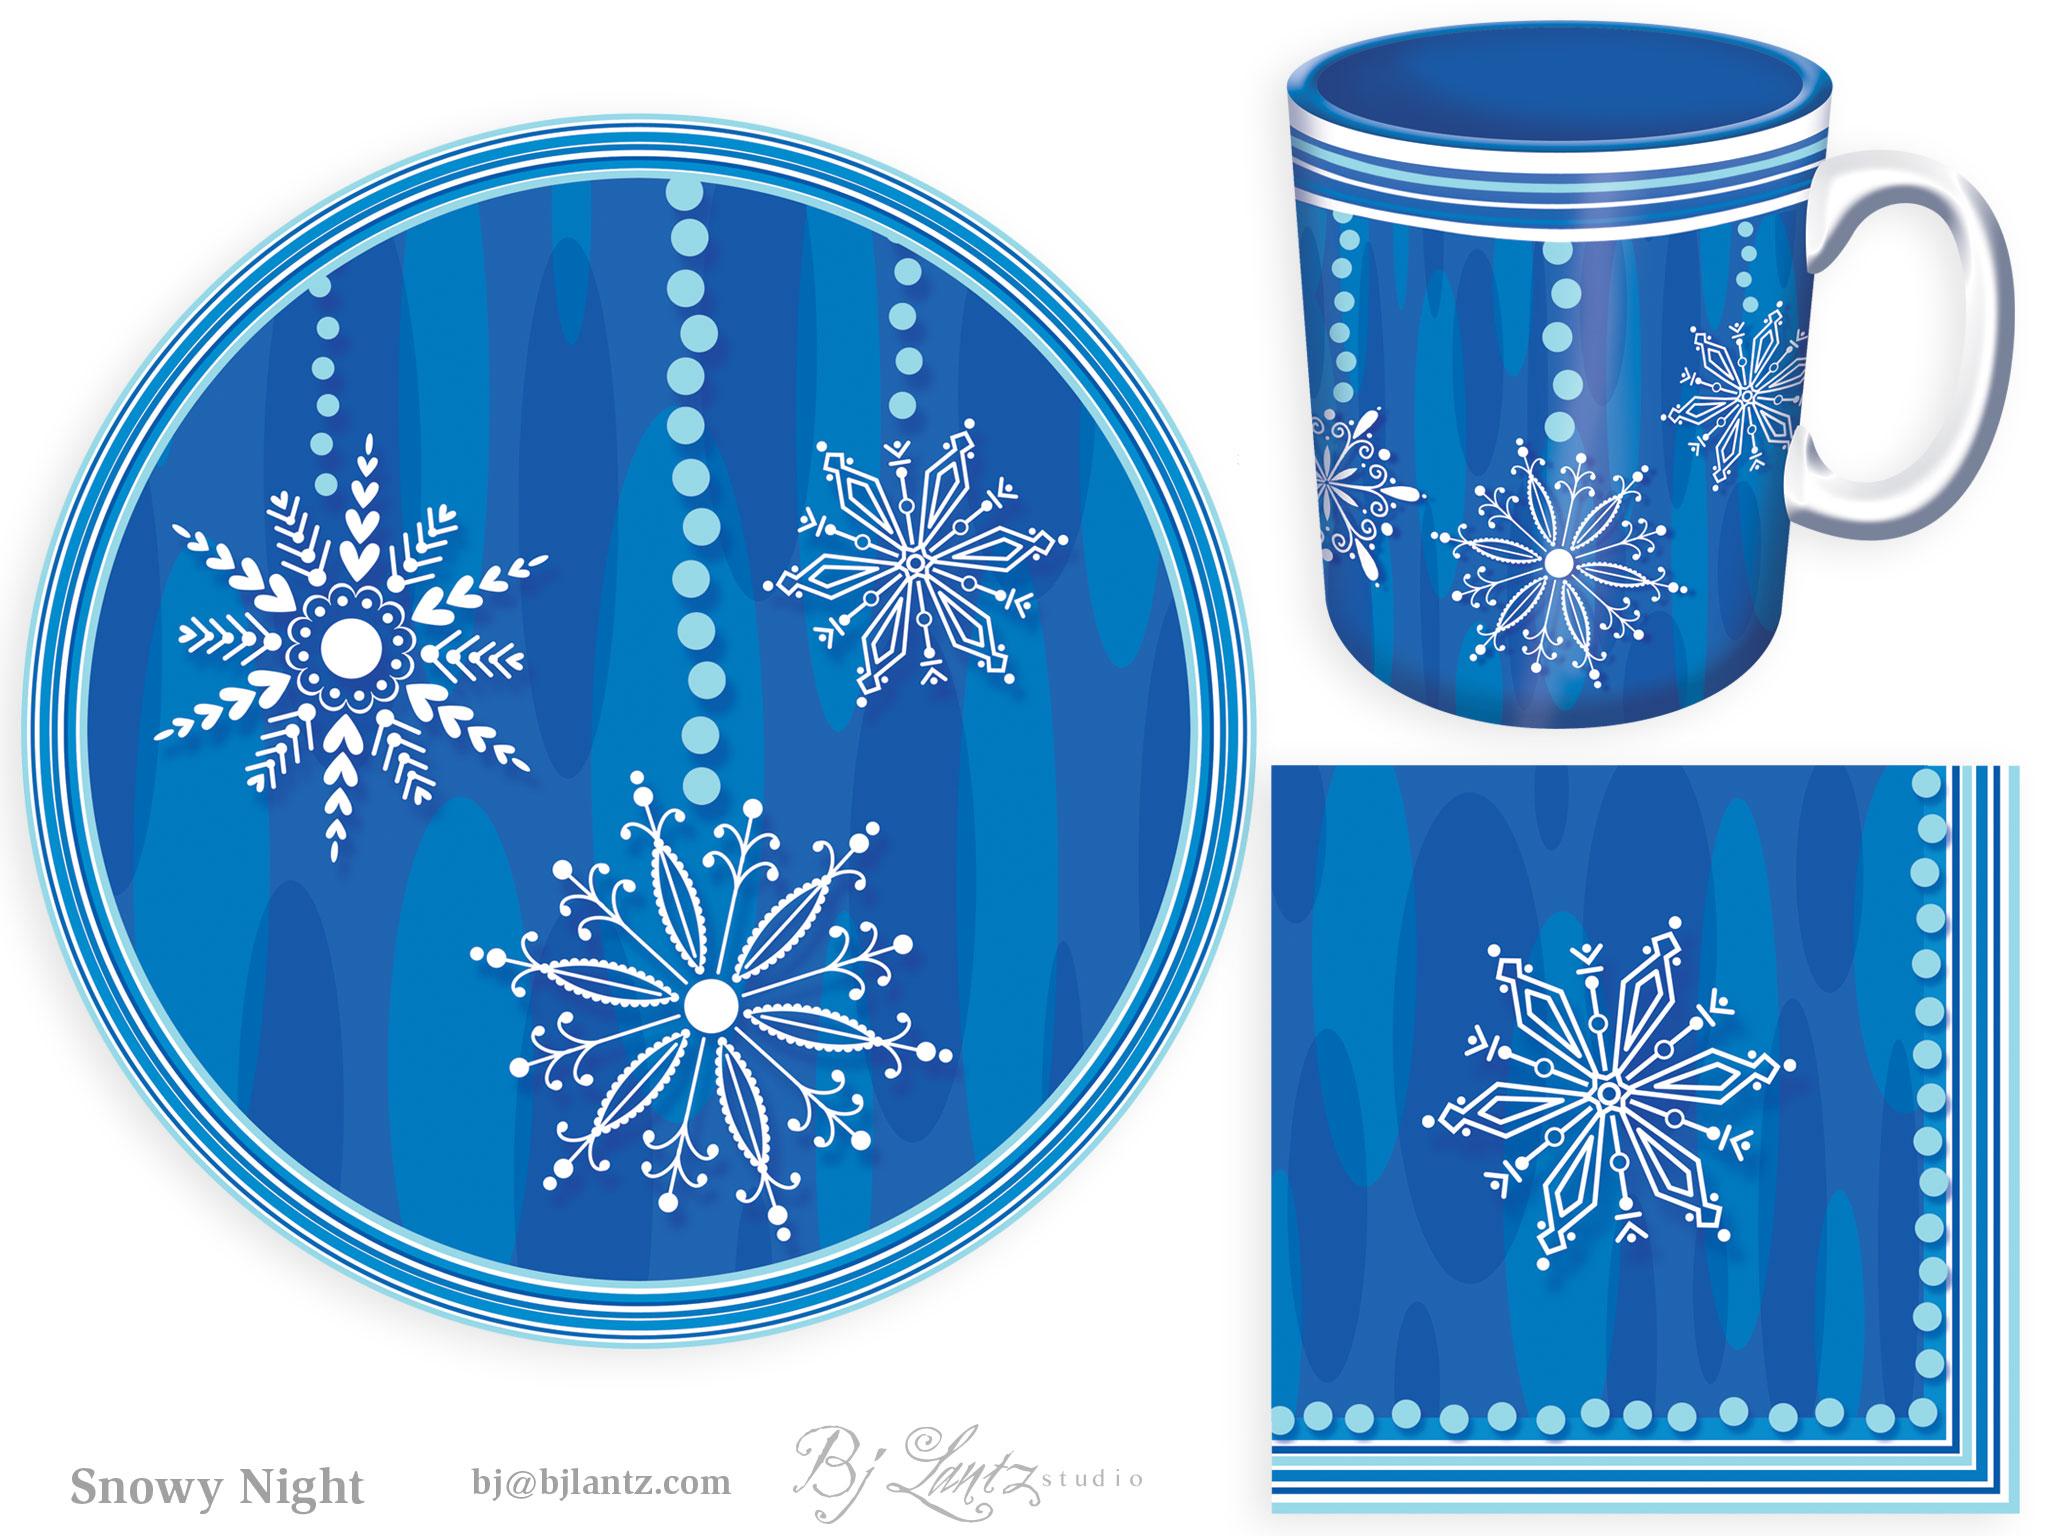 SnowyNight_portfolio_3.jpg